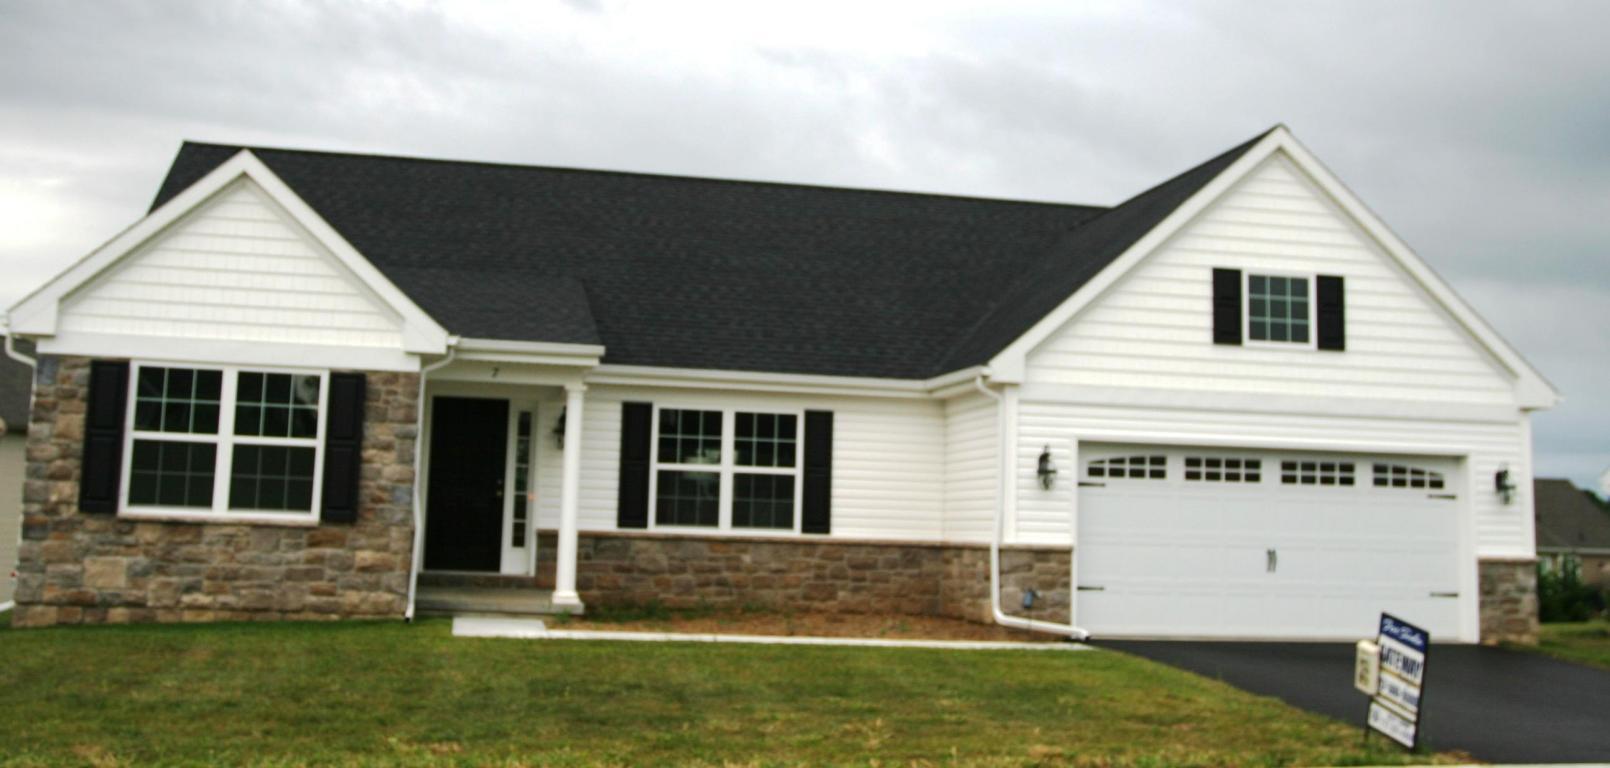 Real Estate for Sale, ListingId:32125609, location: 7 RED SUNSET RUN Ephrata 17522